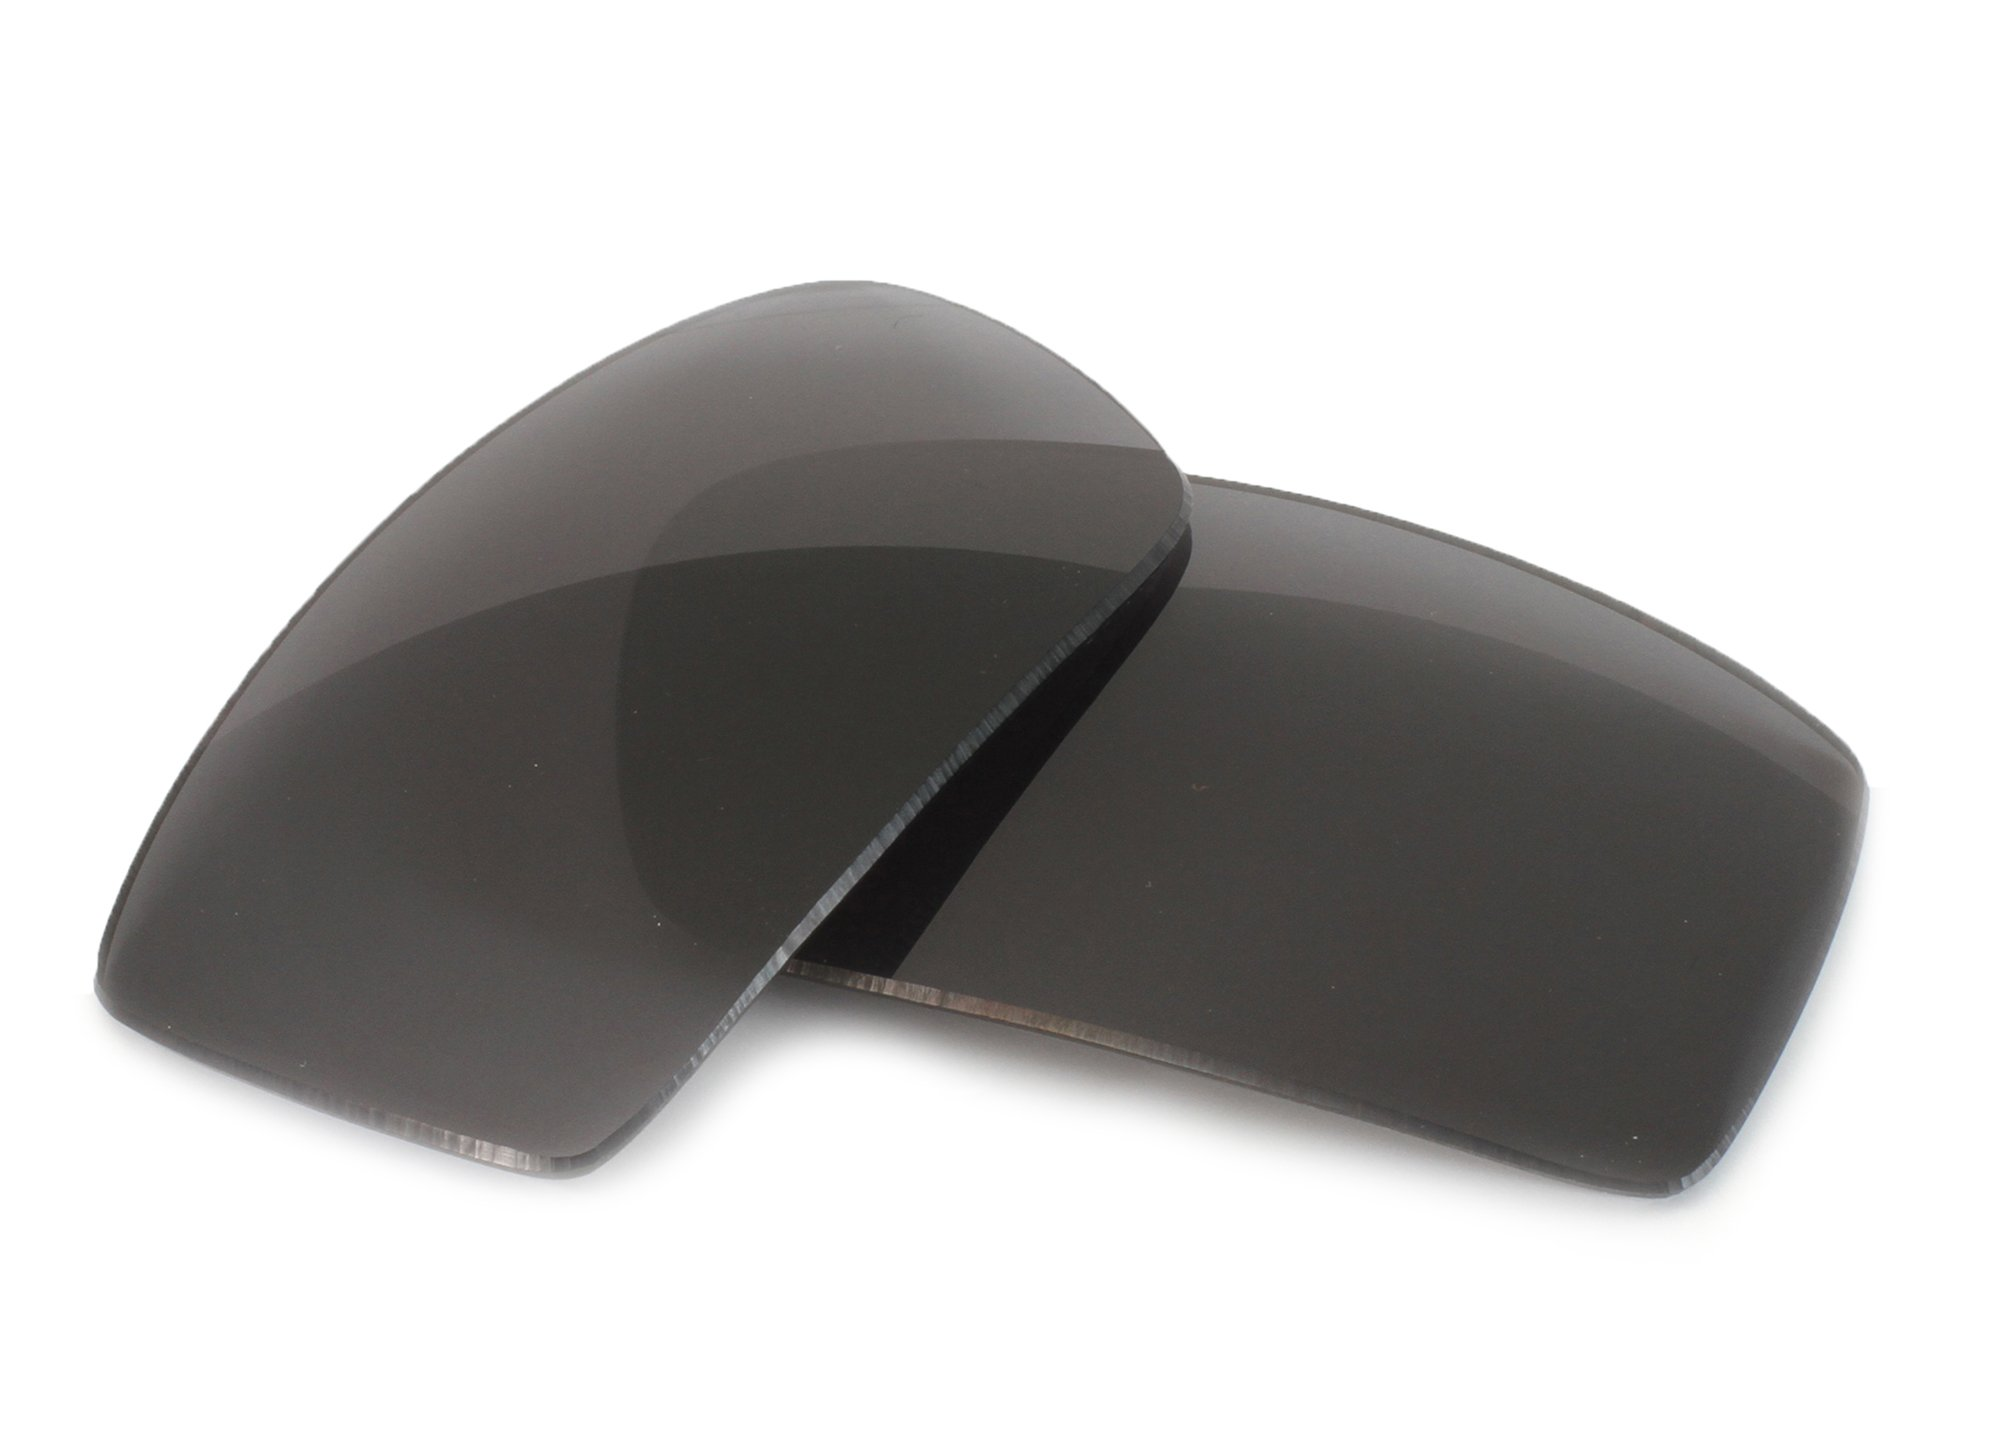 Fuse Lenses for Black Flys Sonic Flys 2 by Fuse Lenses